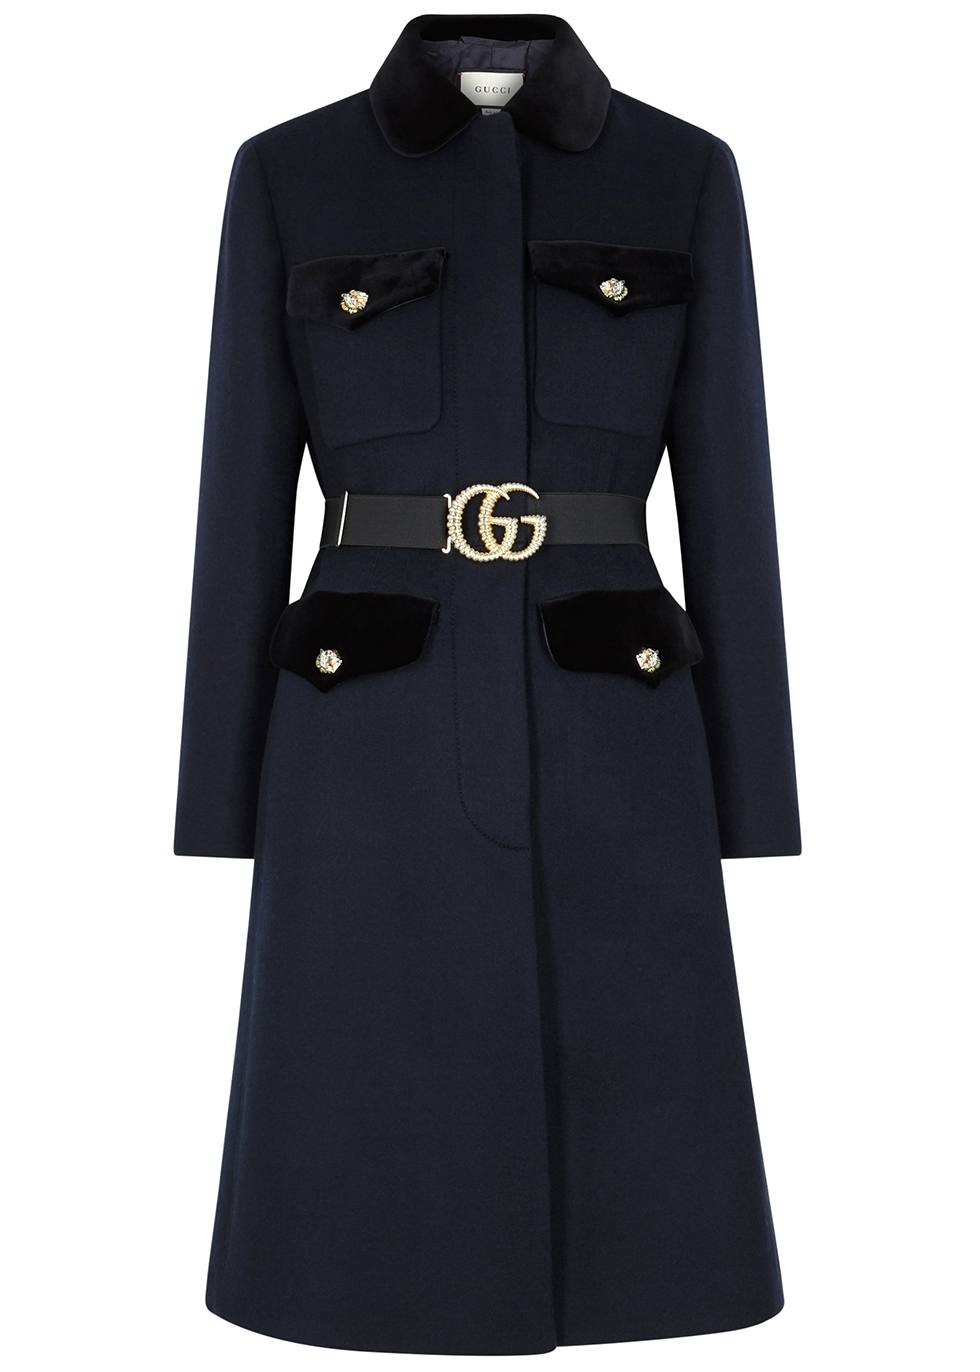 05a4c4e7f08c Gucci - Harvey Nichols